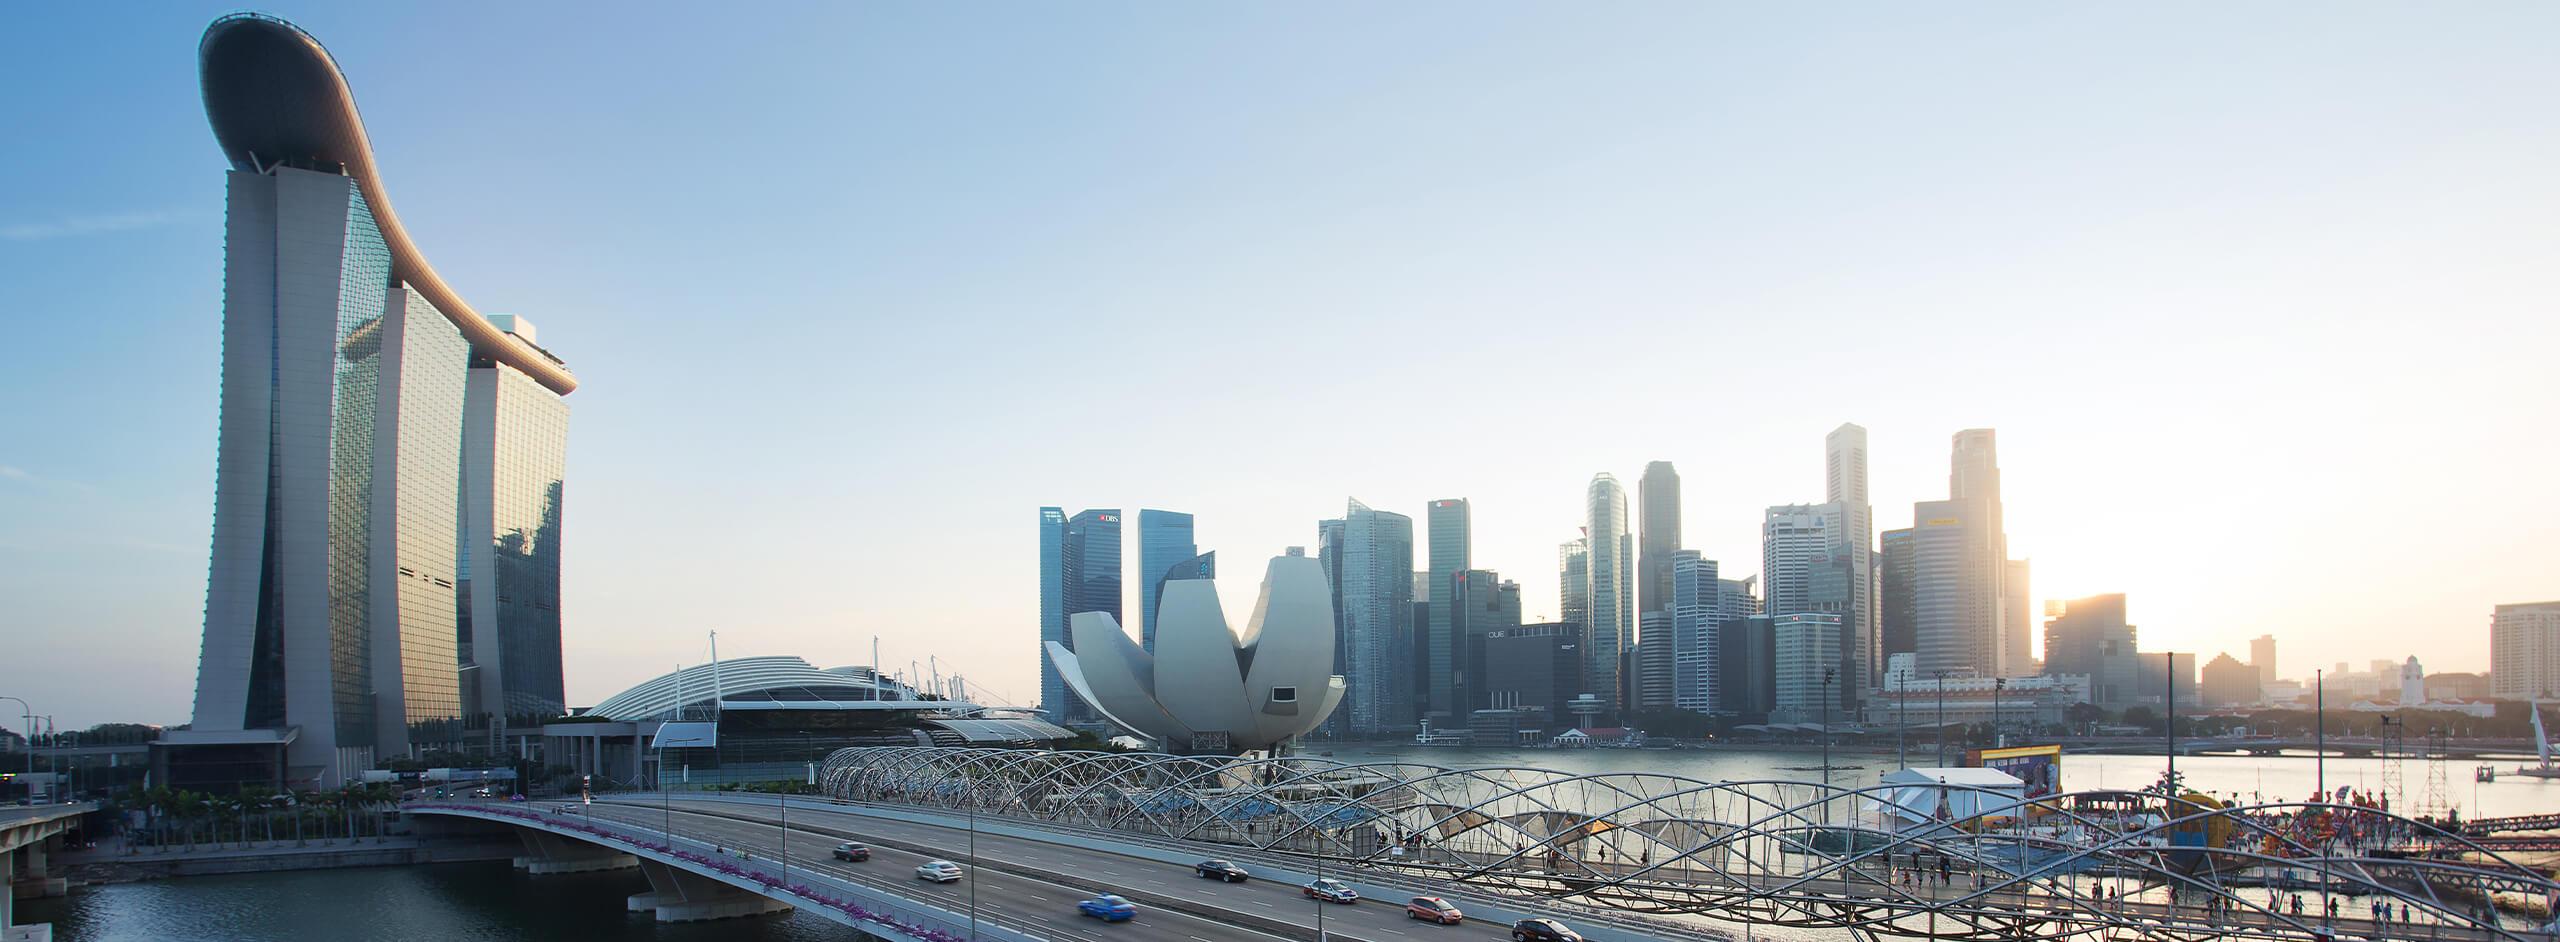 Venue Marina Bay Sands - Home